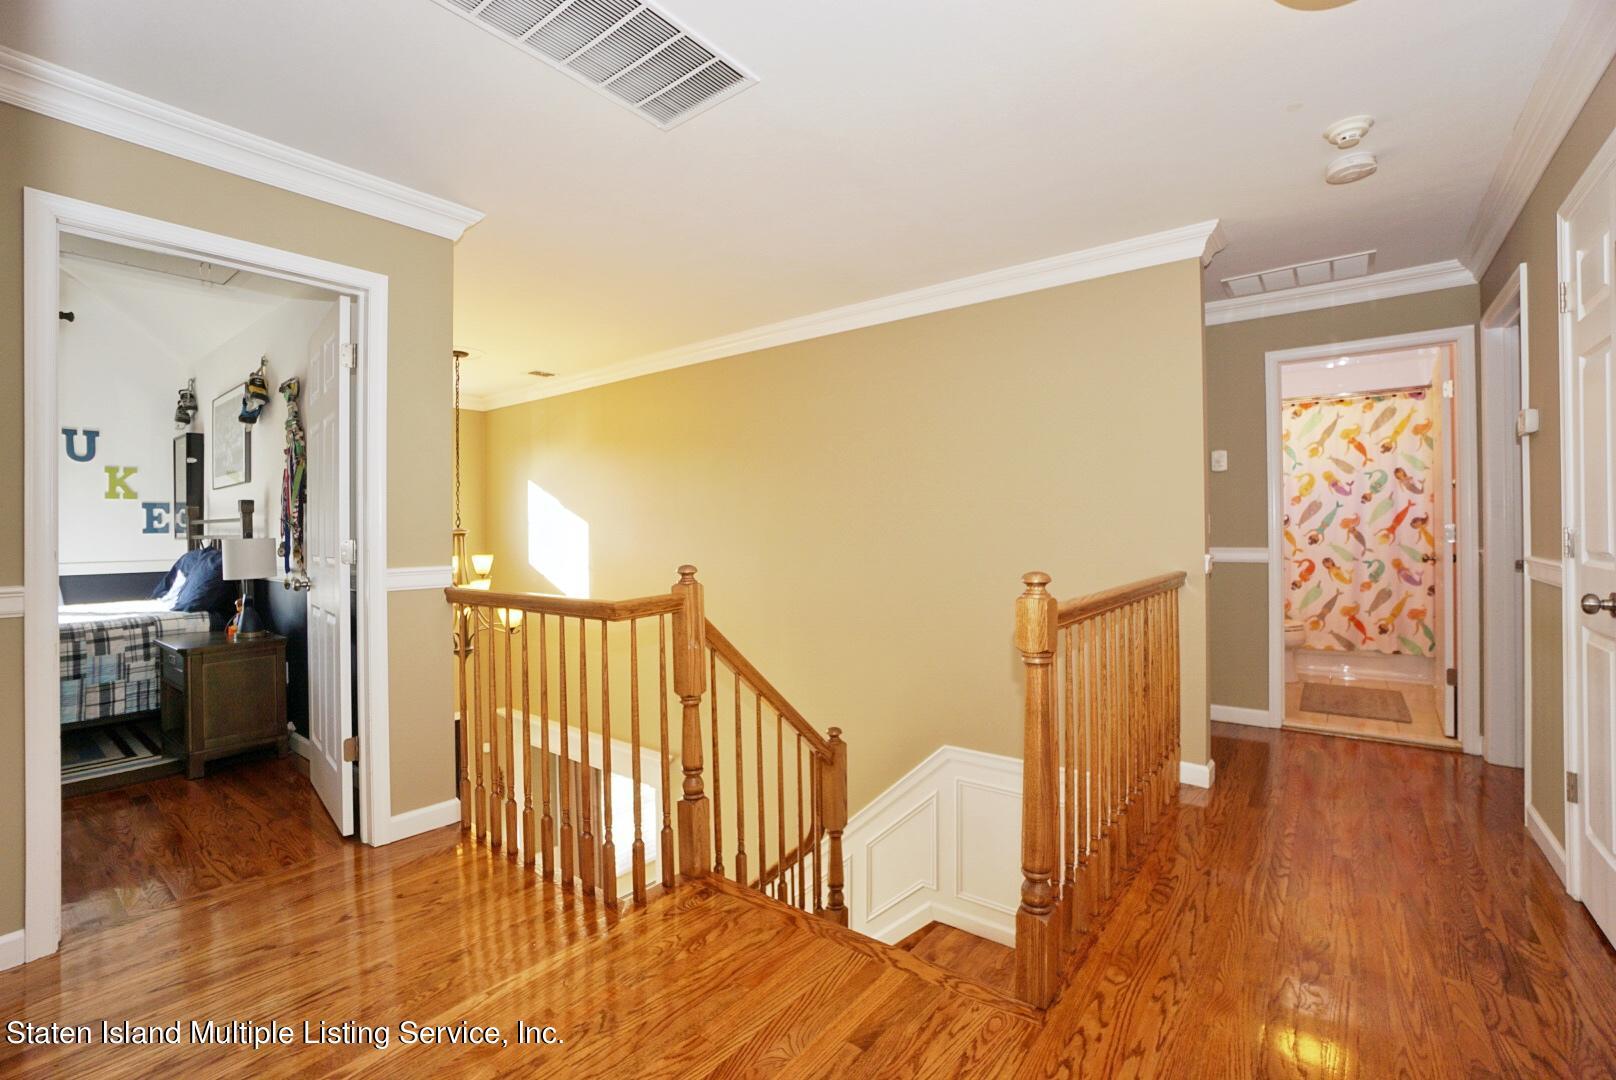 Single Family - Detached 31 Belwood Loop  Staten Island, NY 10307, MLS-1143133-29